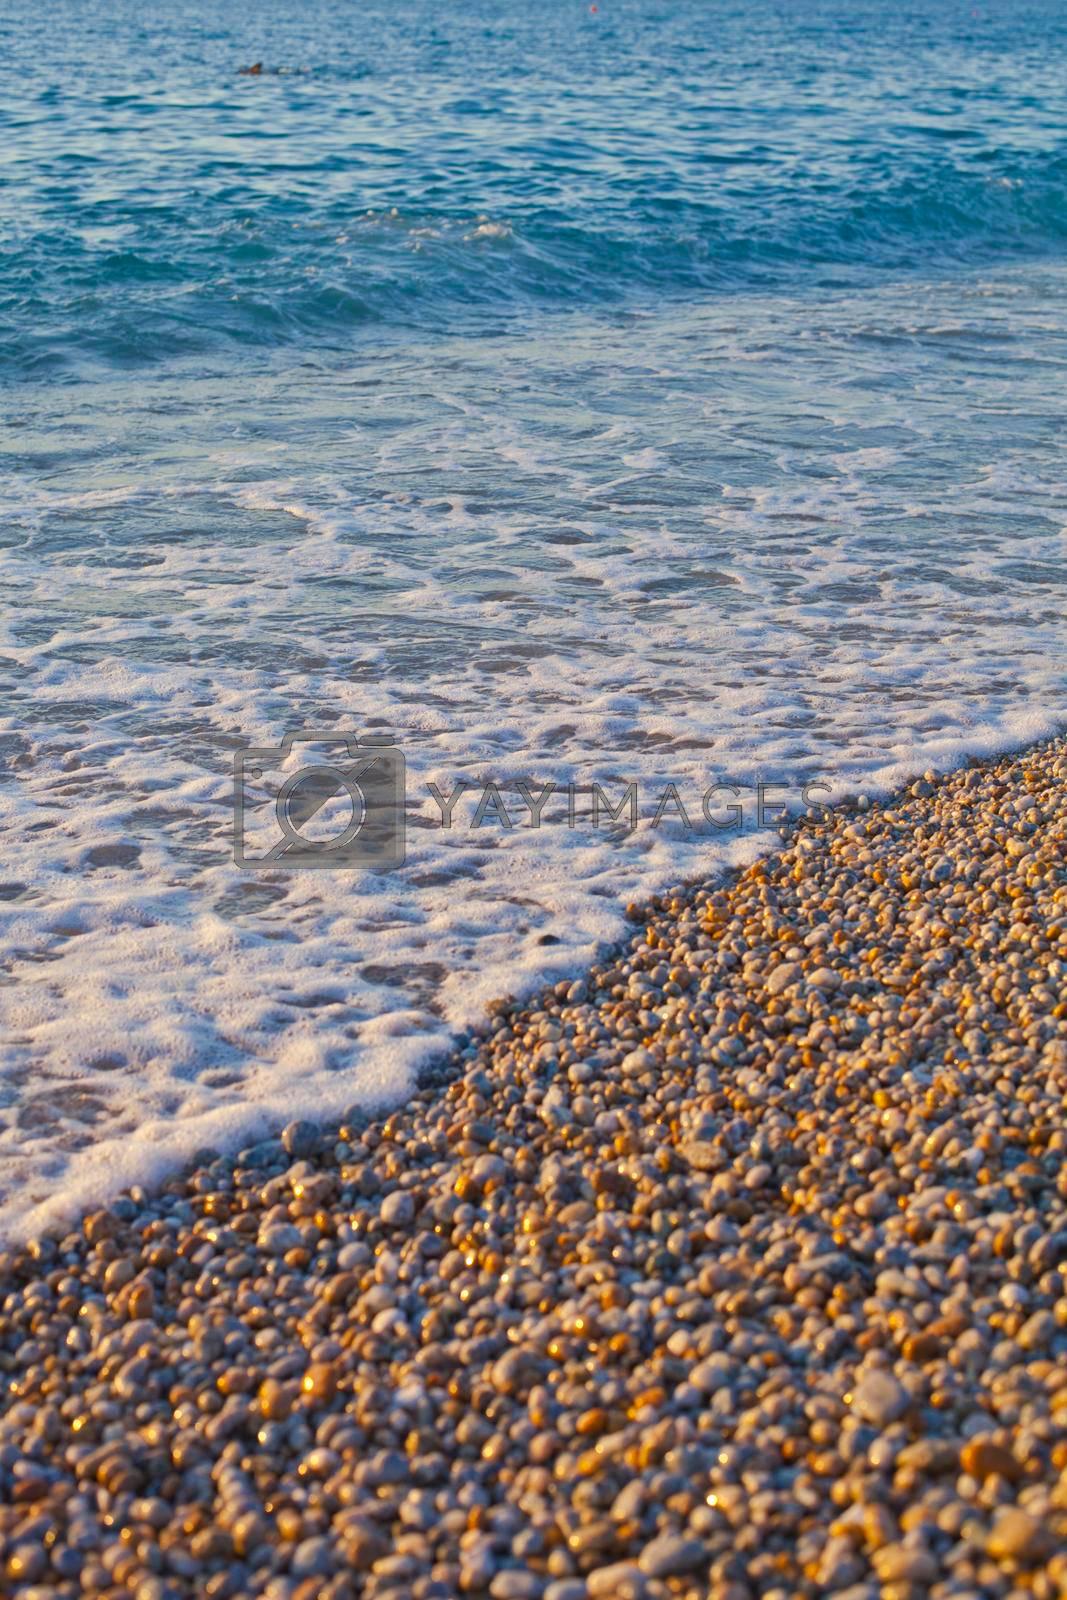 Pebble stones by the sea. Waves of blue Tyrrhenian sea. Calabria, Italy.